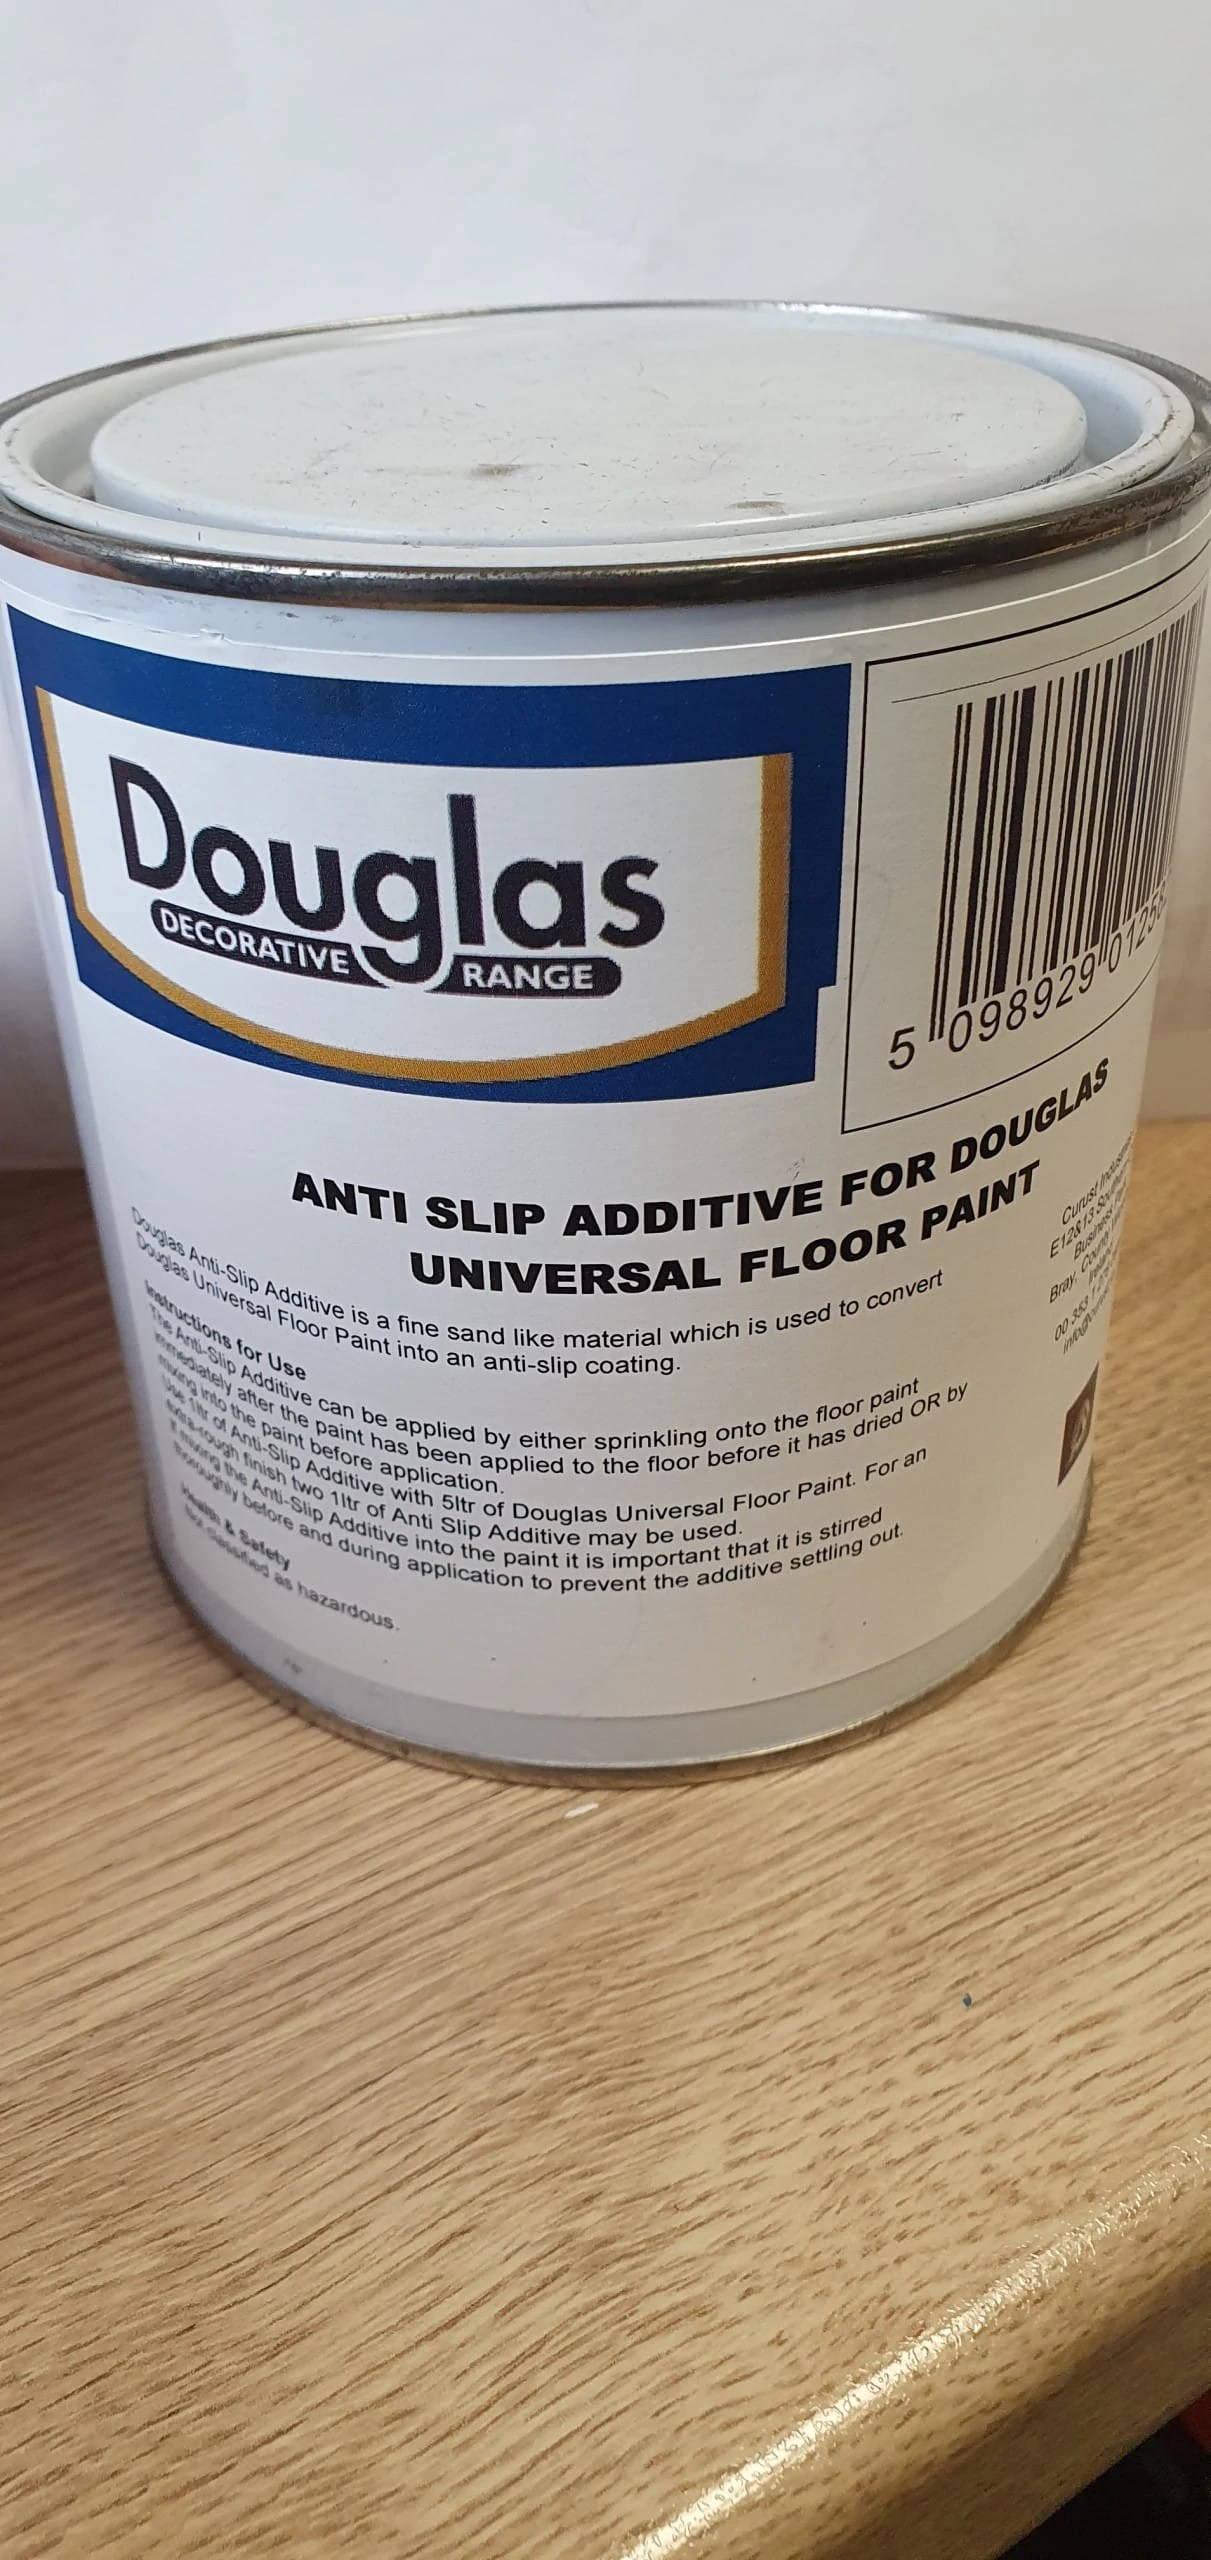 Douglas-Anti-Slip-Additive-For-Paint-2kg